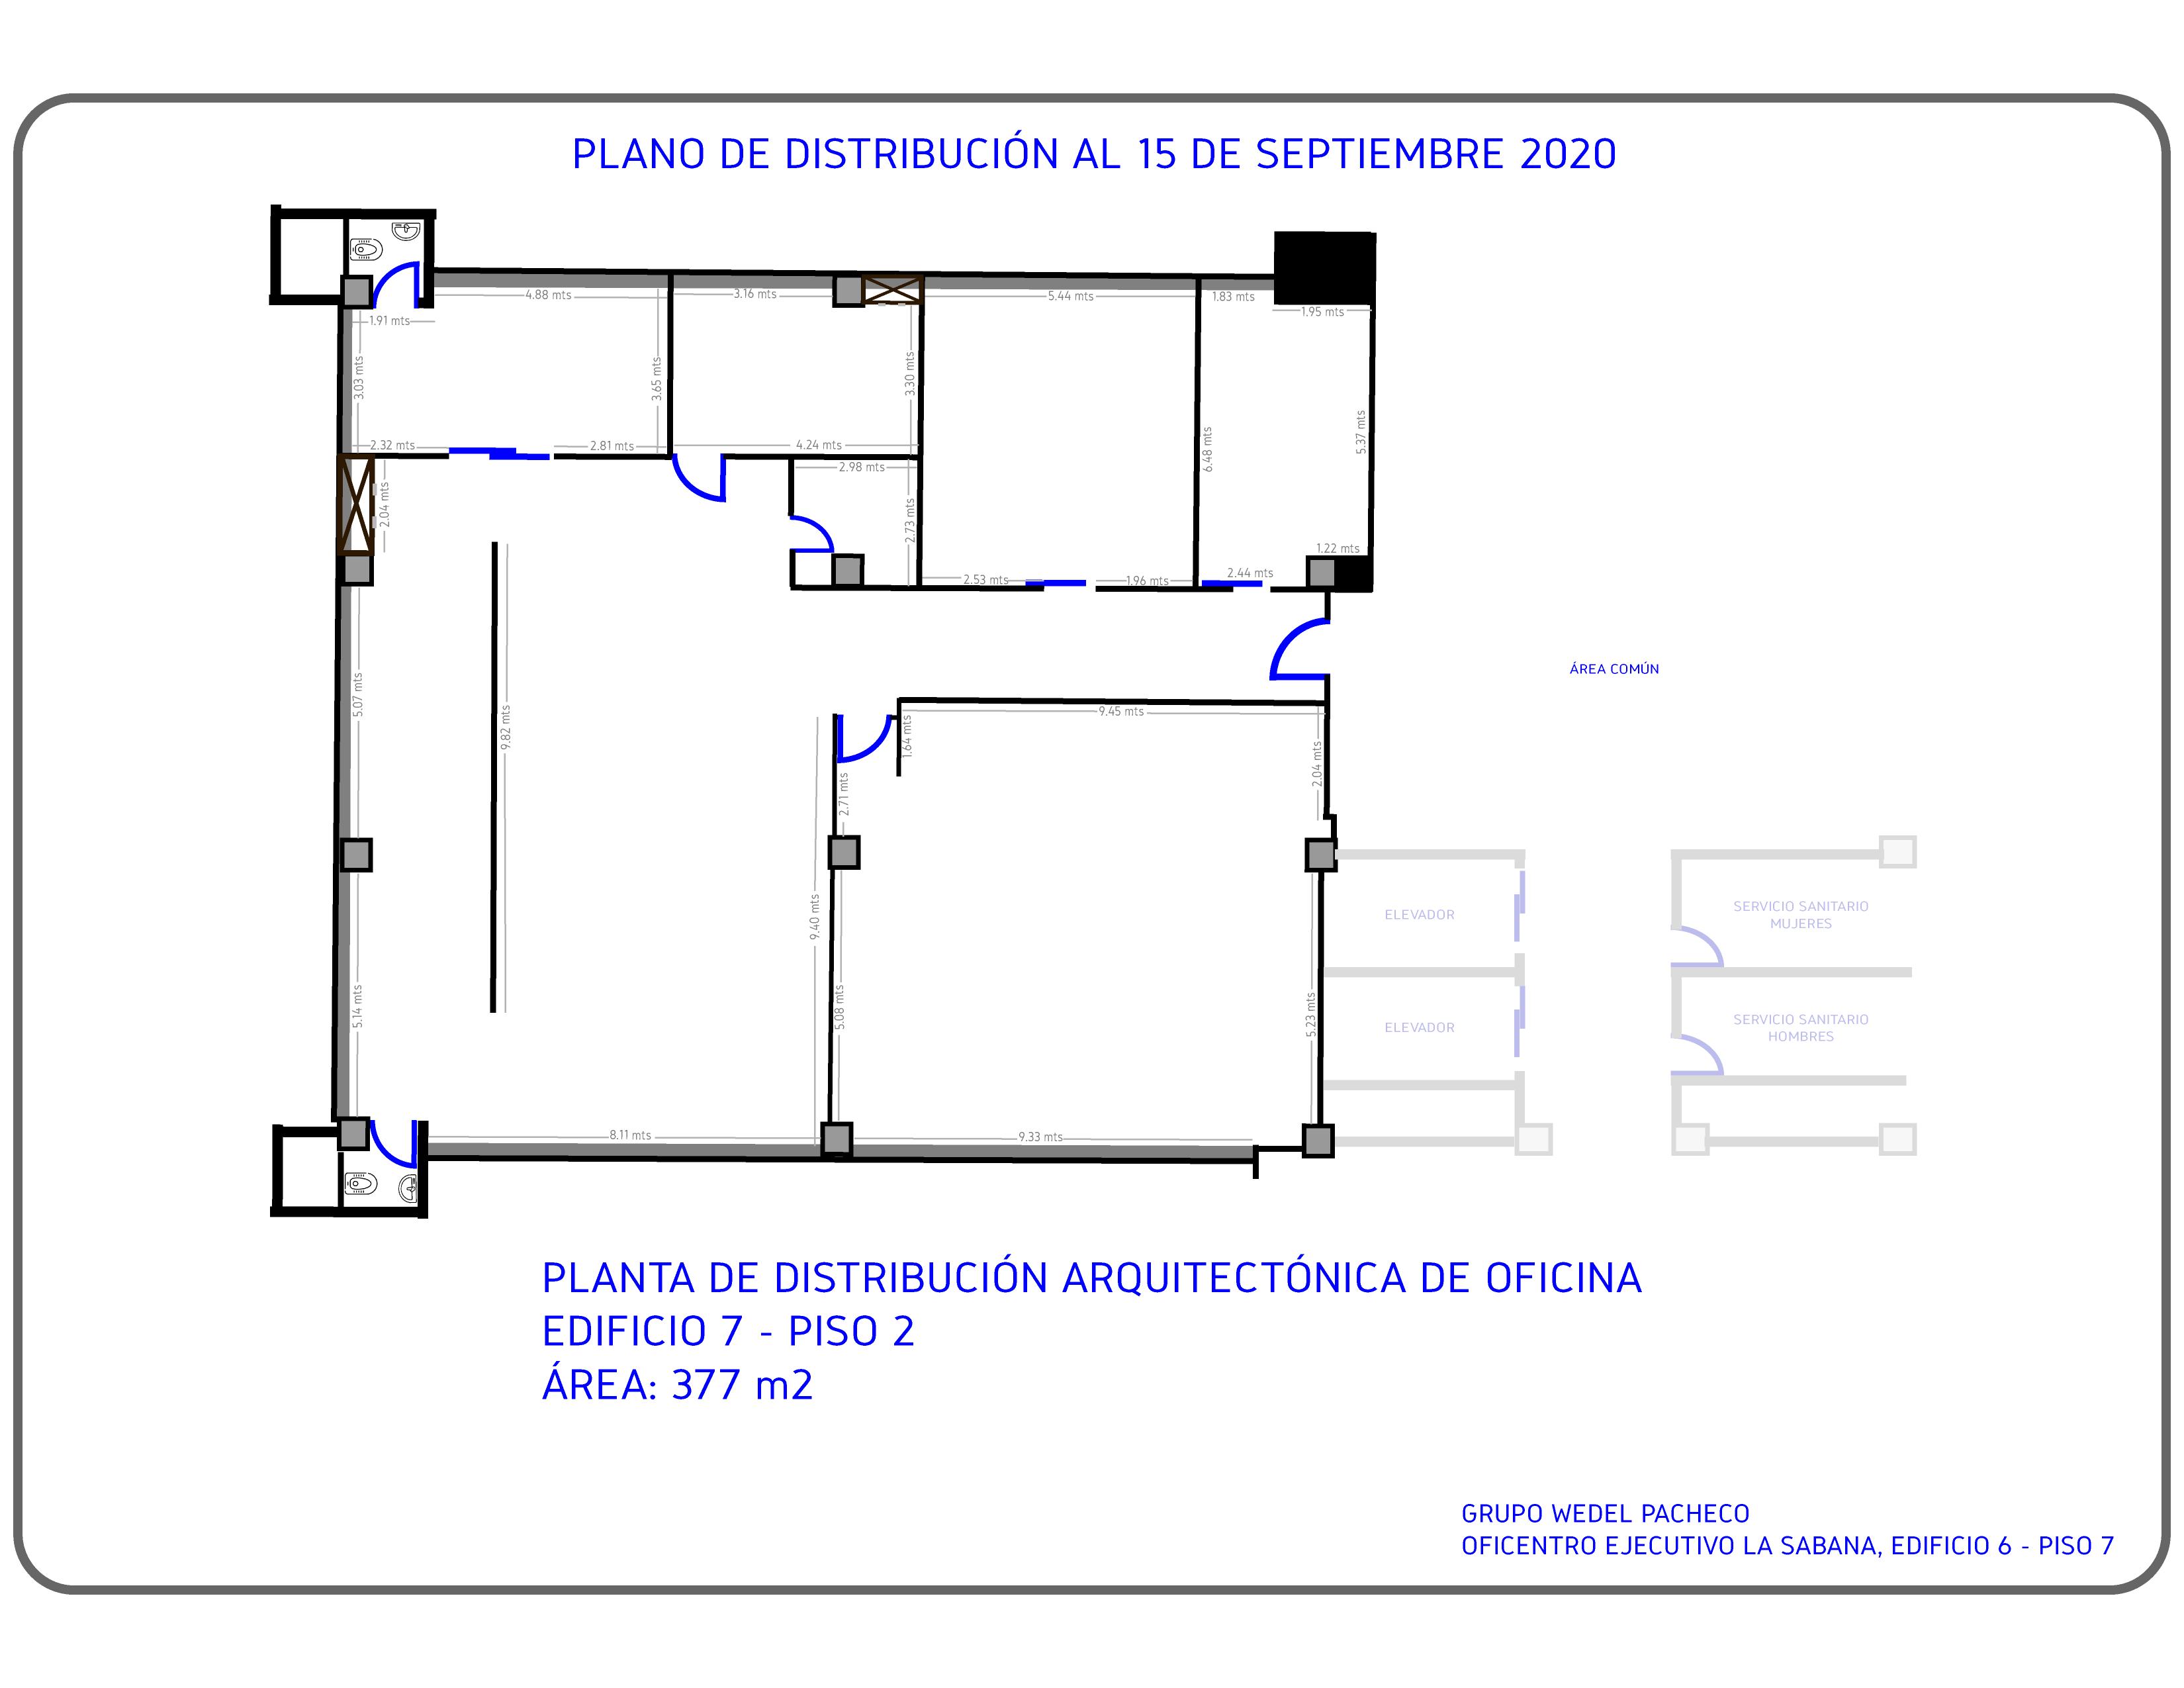 Alquiler de Oficina de 377.85 m2